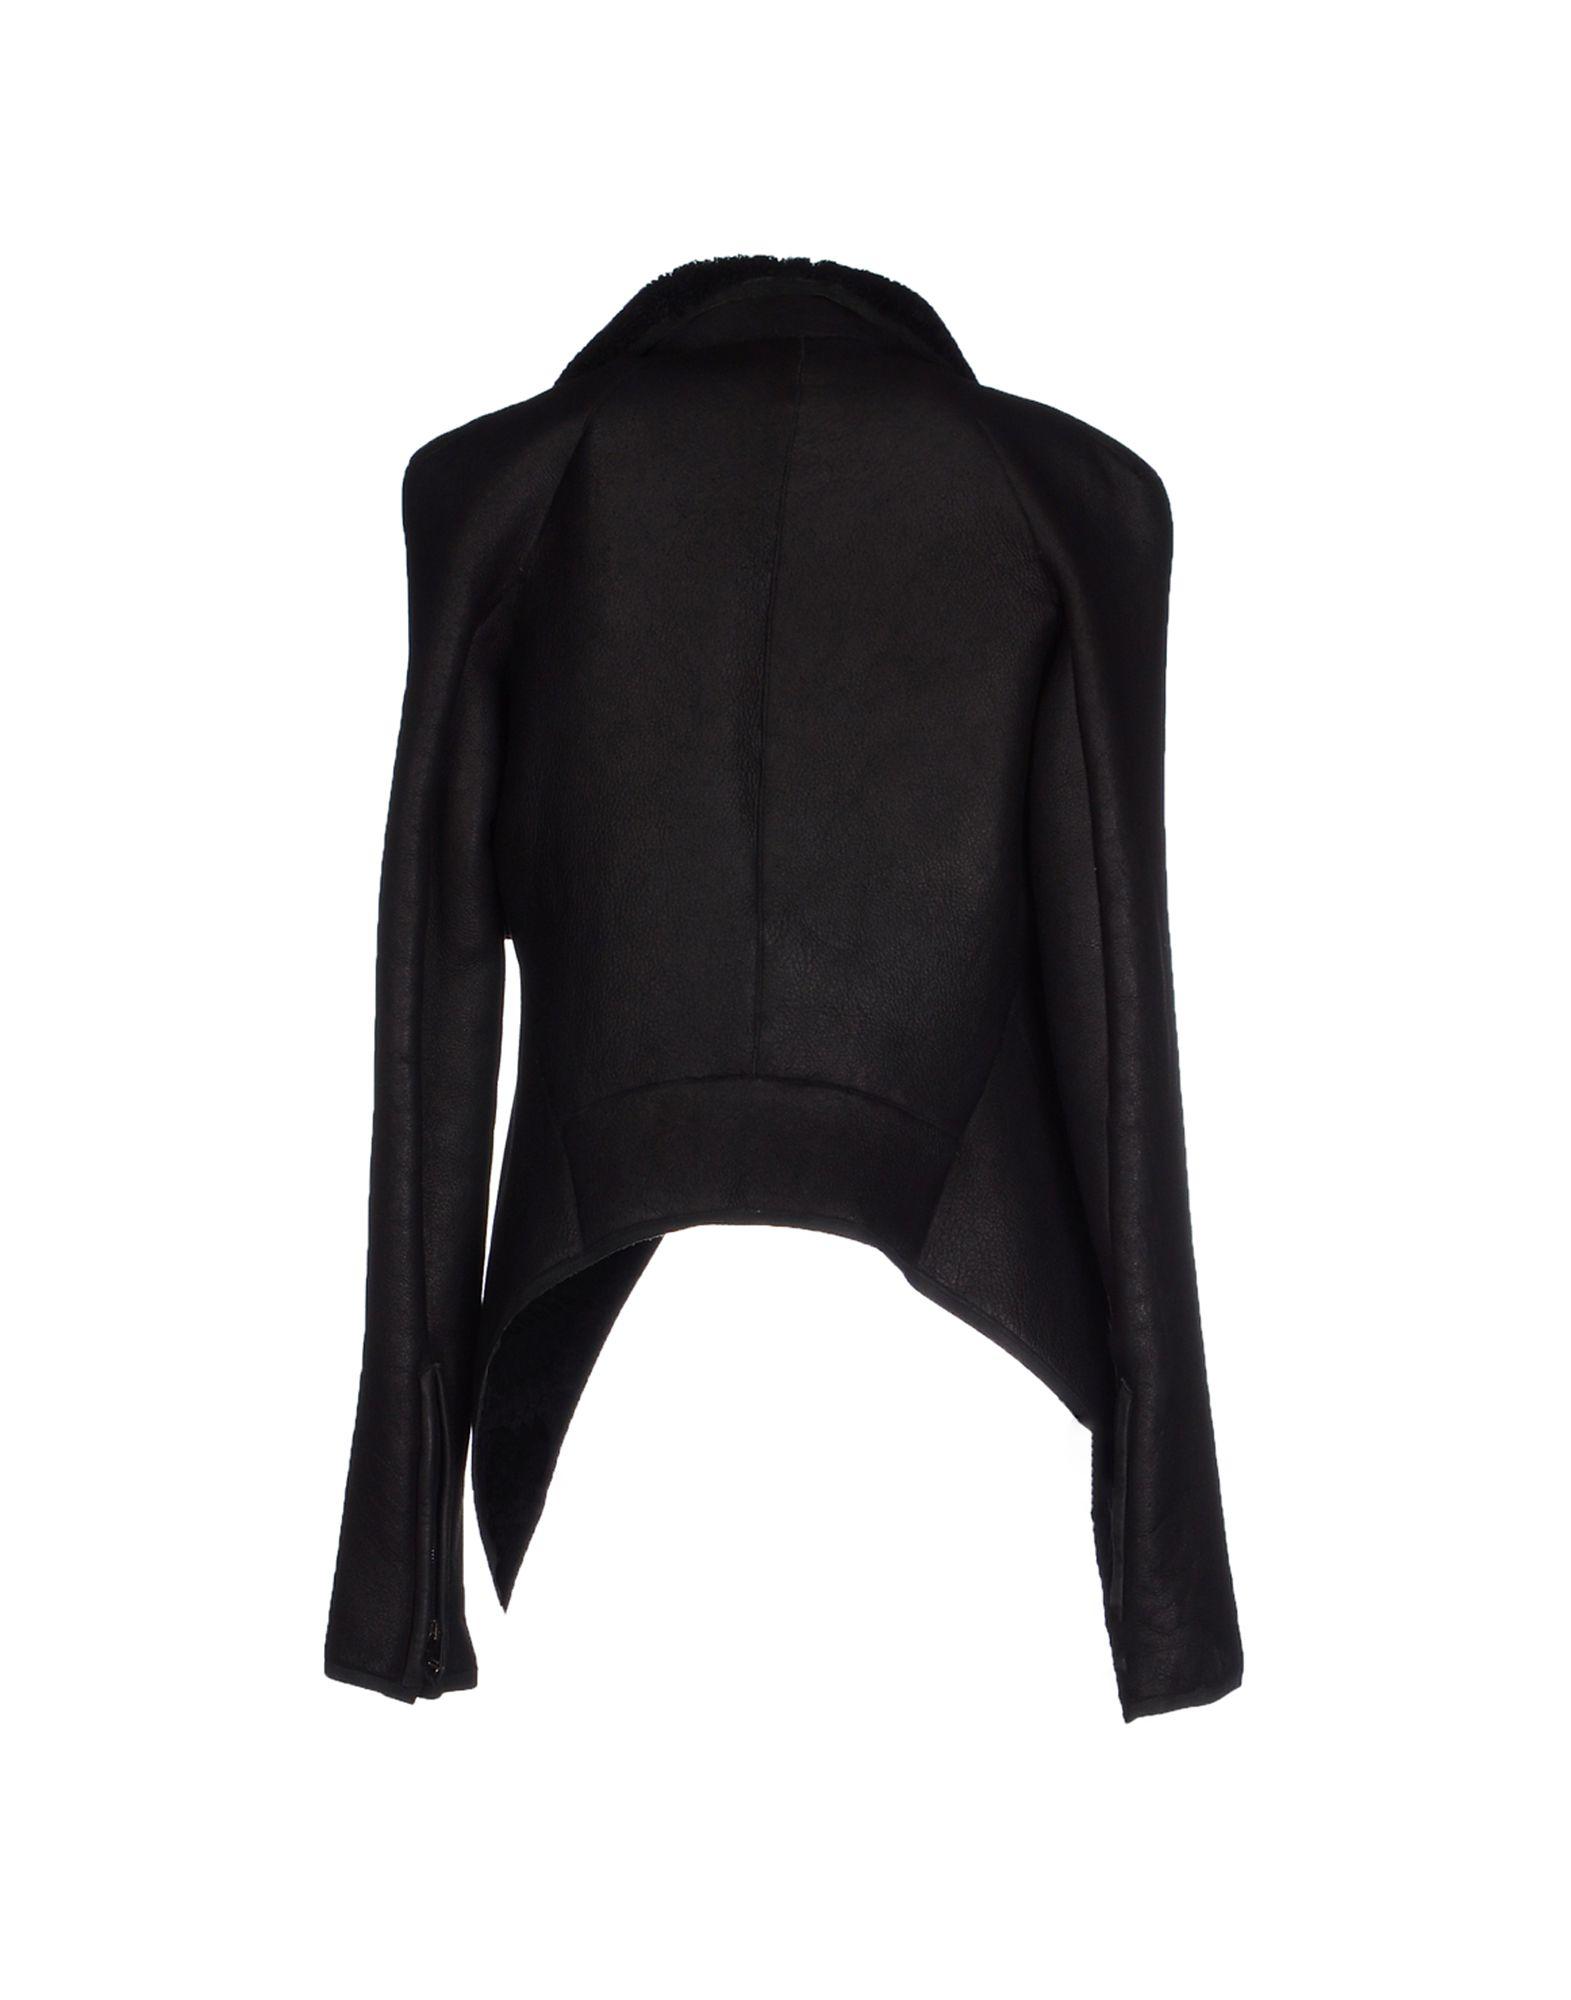 Gareth pugh Jacket in Black